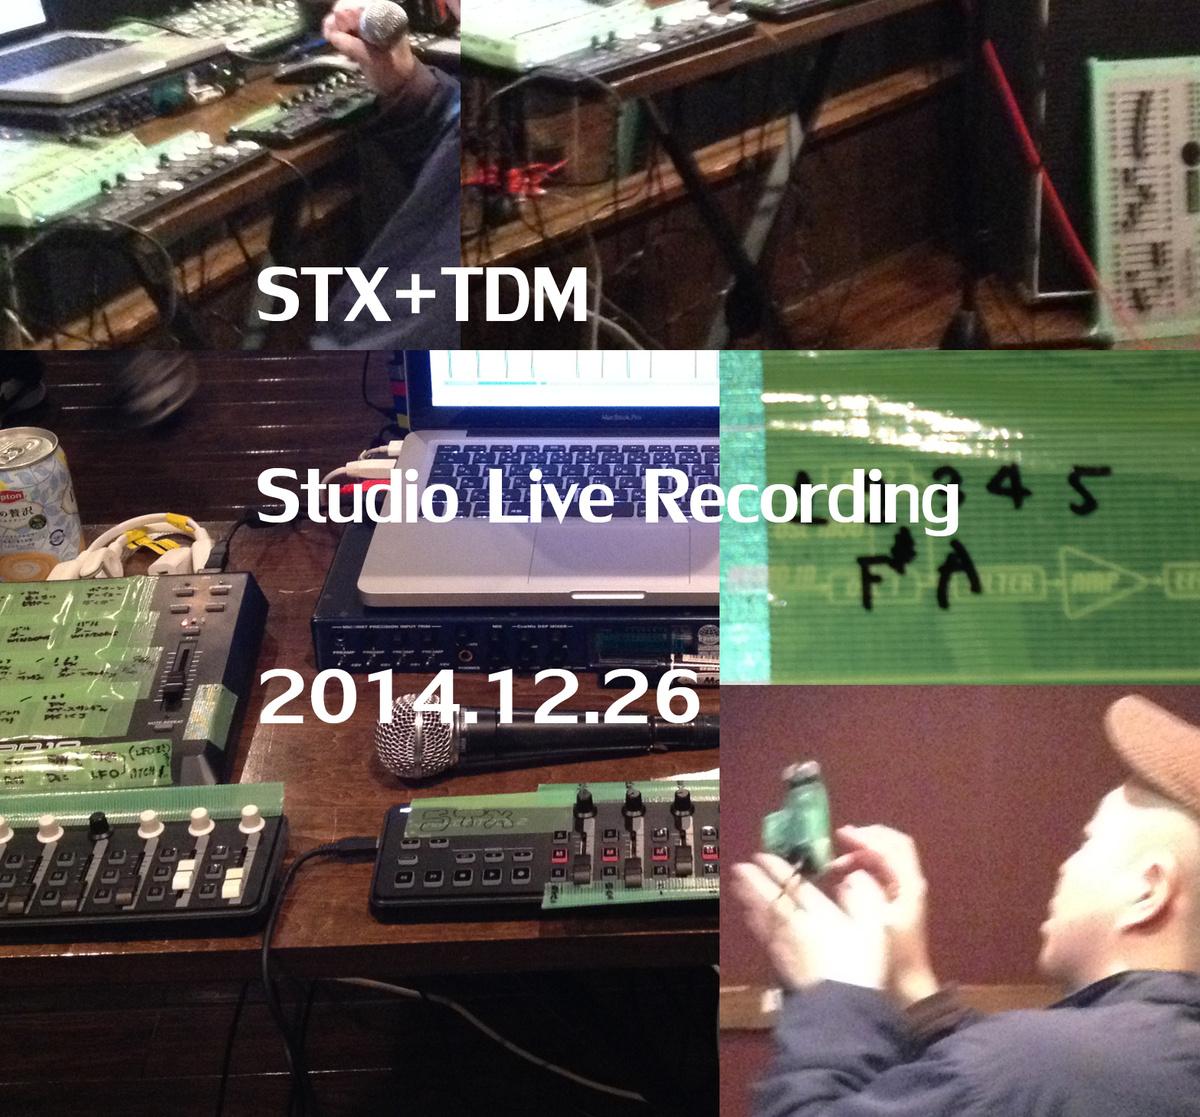 STX + TDM Studio Live Recording 201